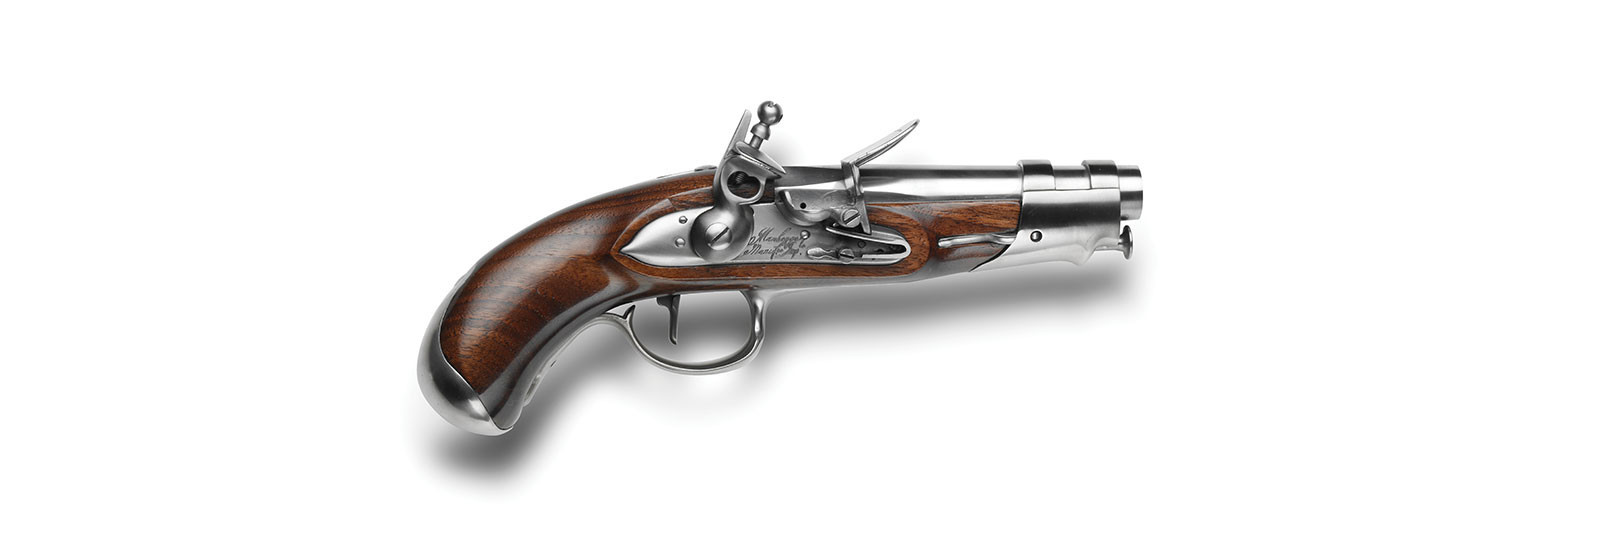 Anix gendarmerie cal.15,2mm